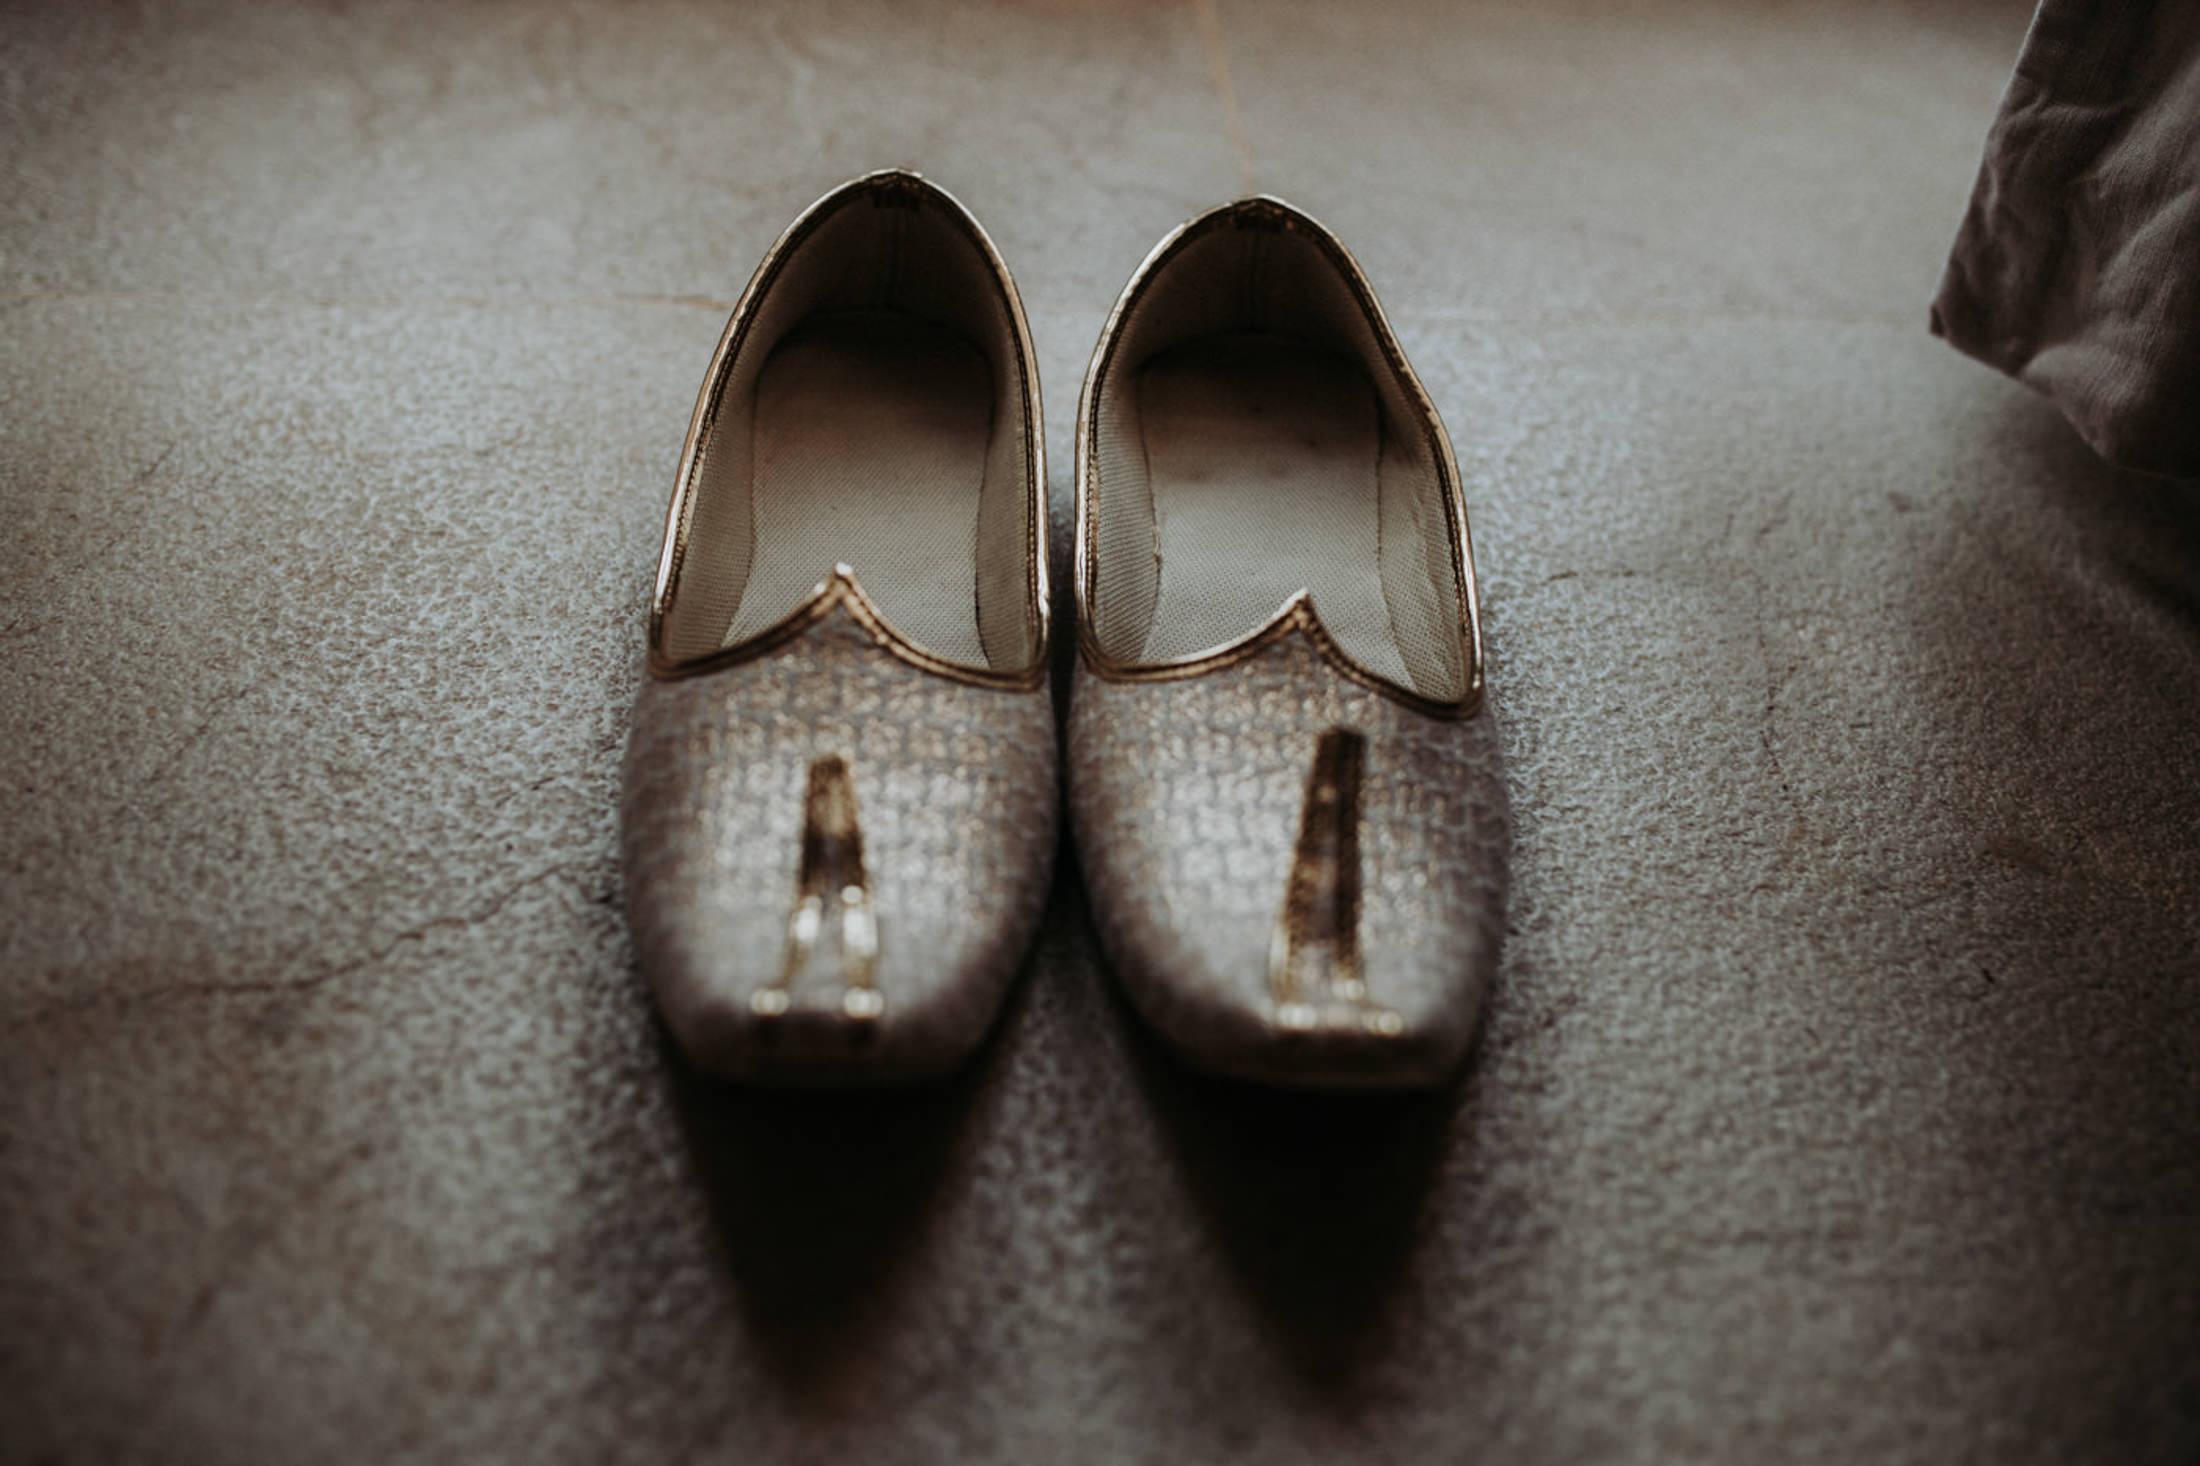 Wedding_Photographer_Mallorca_Daniela-Marquardt_Photography_New_York_Iceland_Tuscany_Santorini_Portugal_Austria_Bavaria_Elopement_Hochzeitsfotograf_AntjeRajat2_17